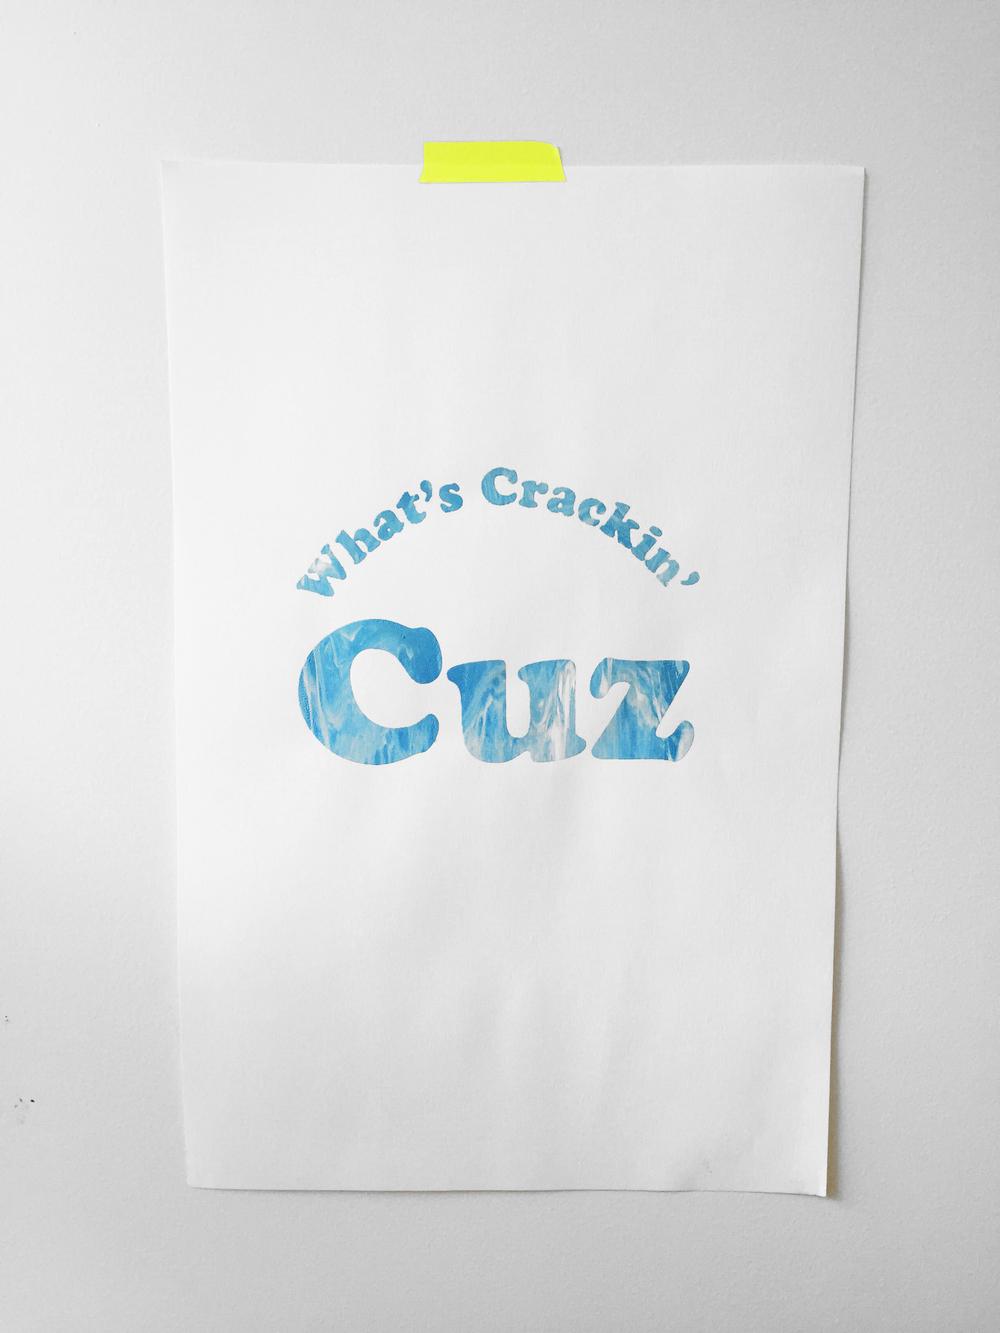 What's Crackin' Cuz?.jpg